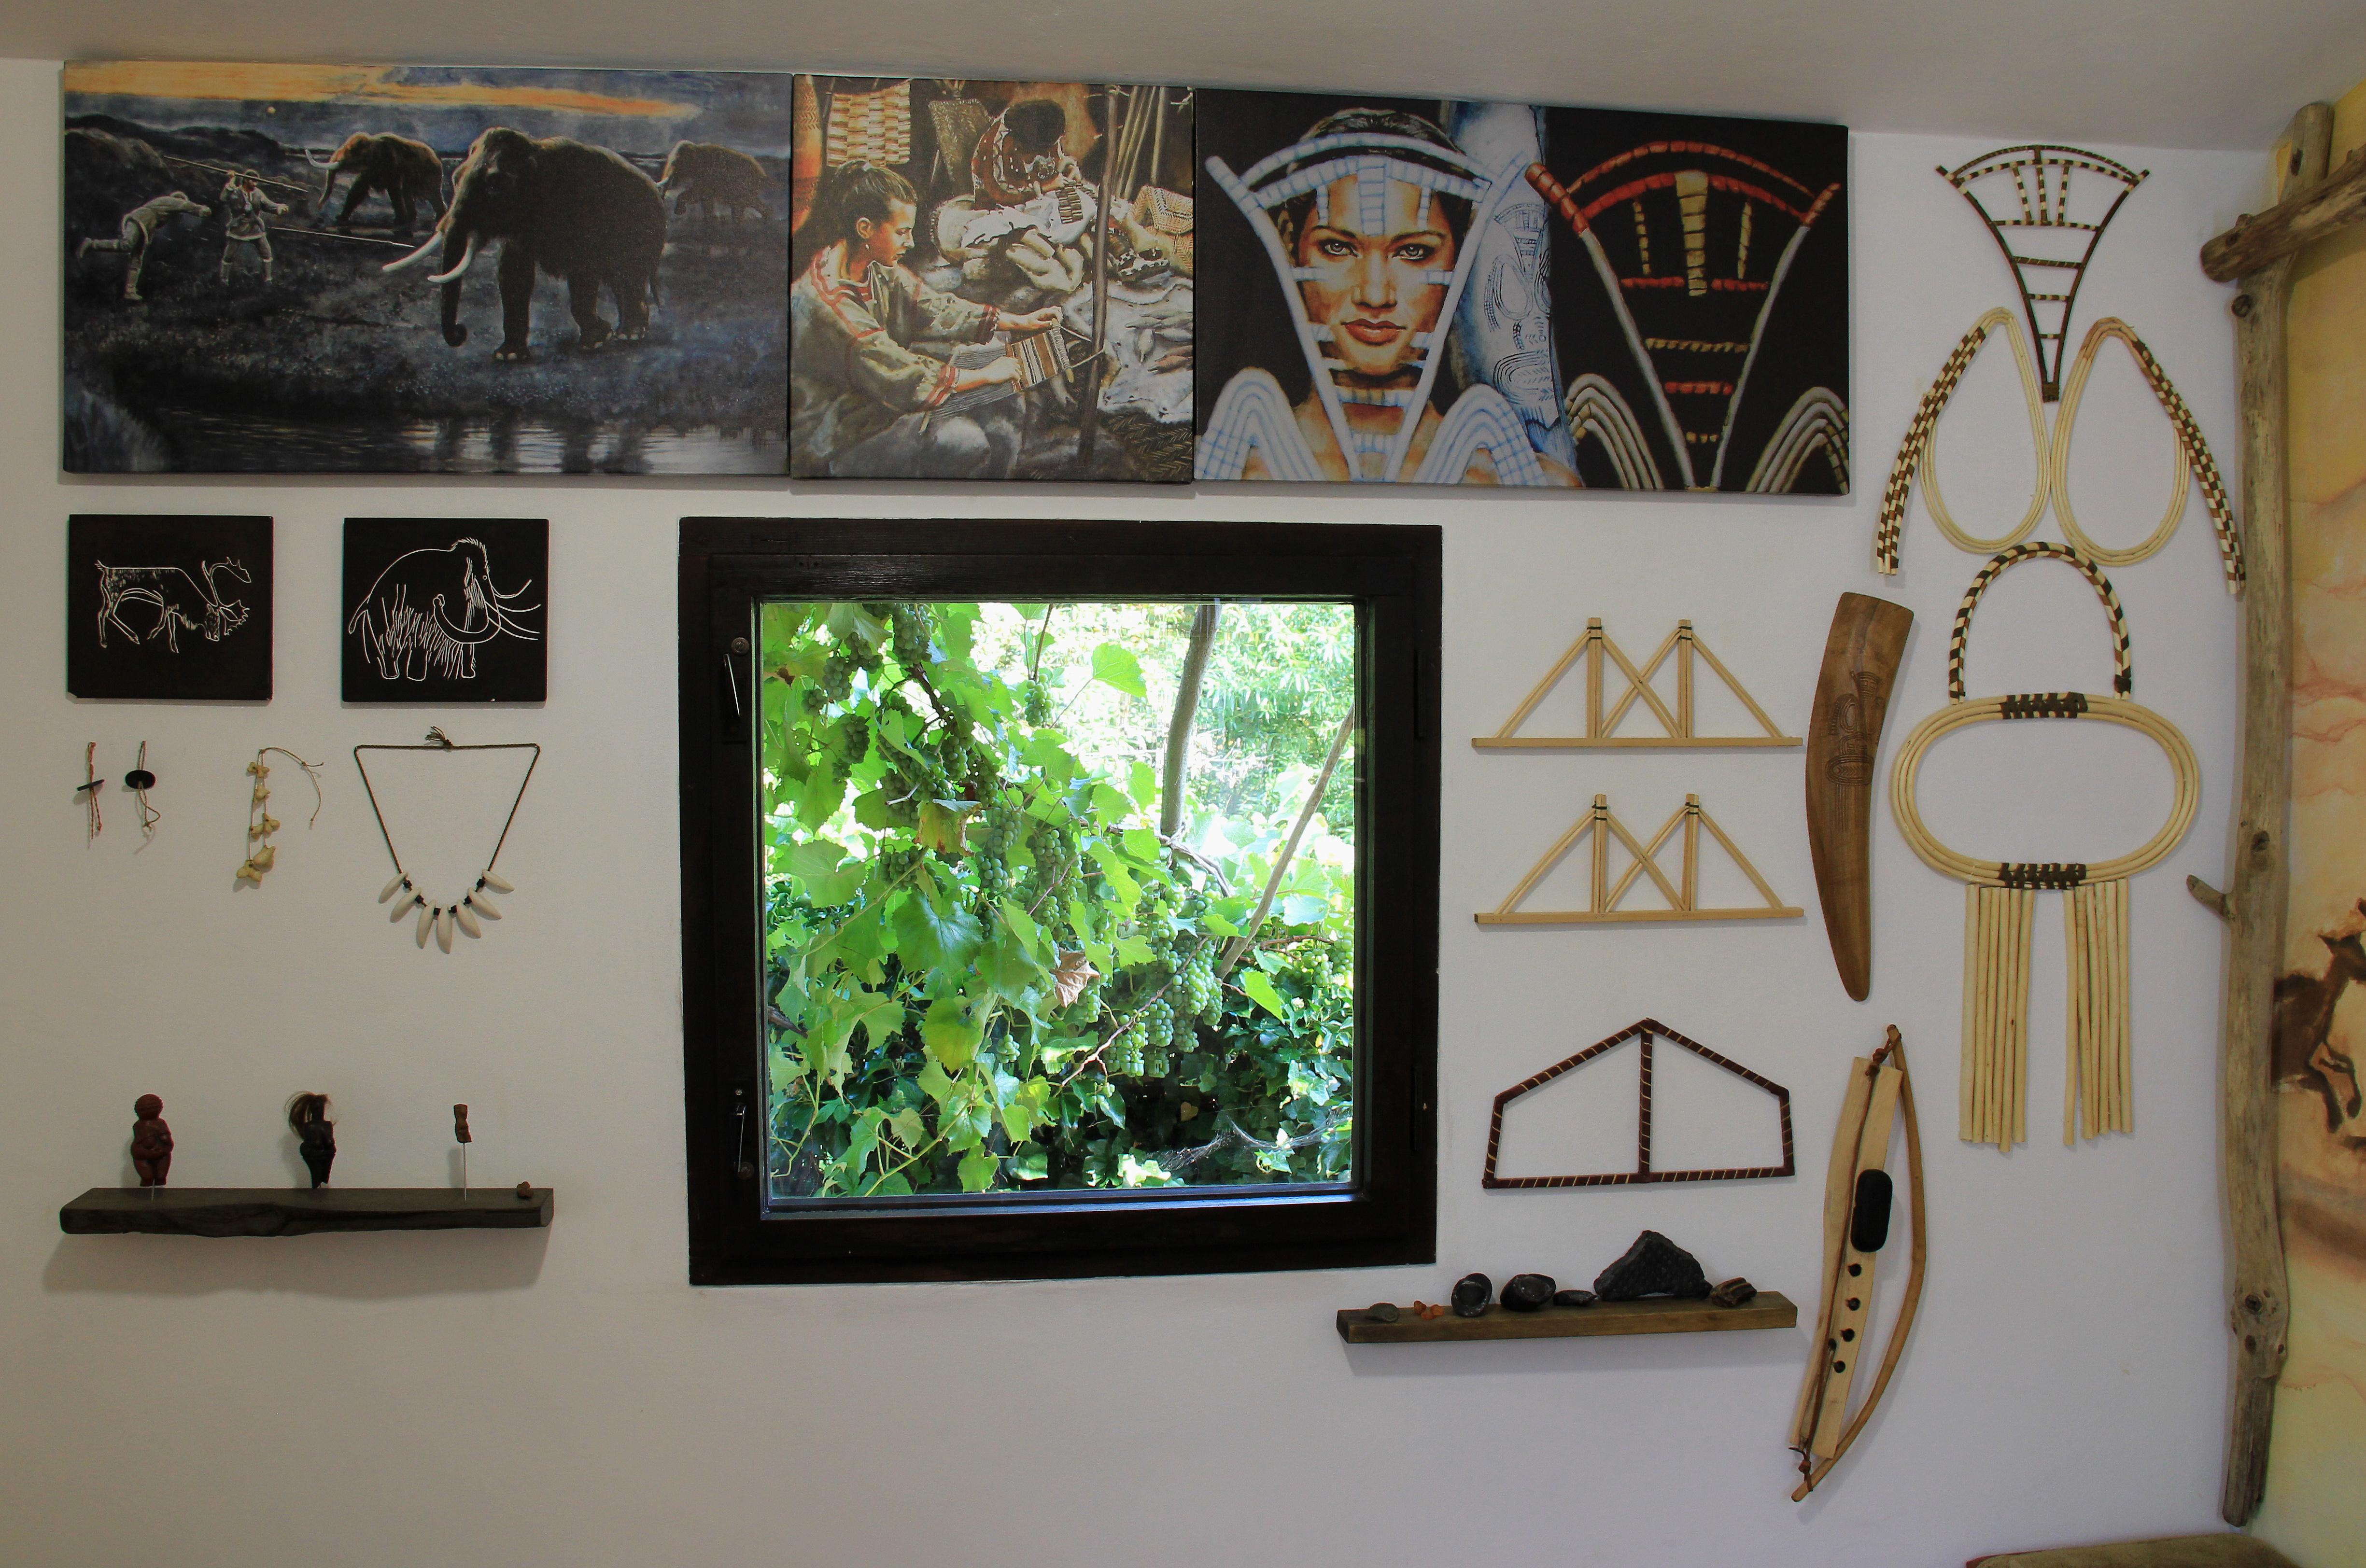 Pravěké muzeum v zahradním domku pana Sonnka